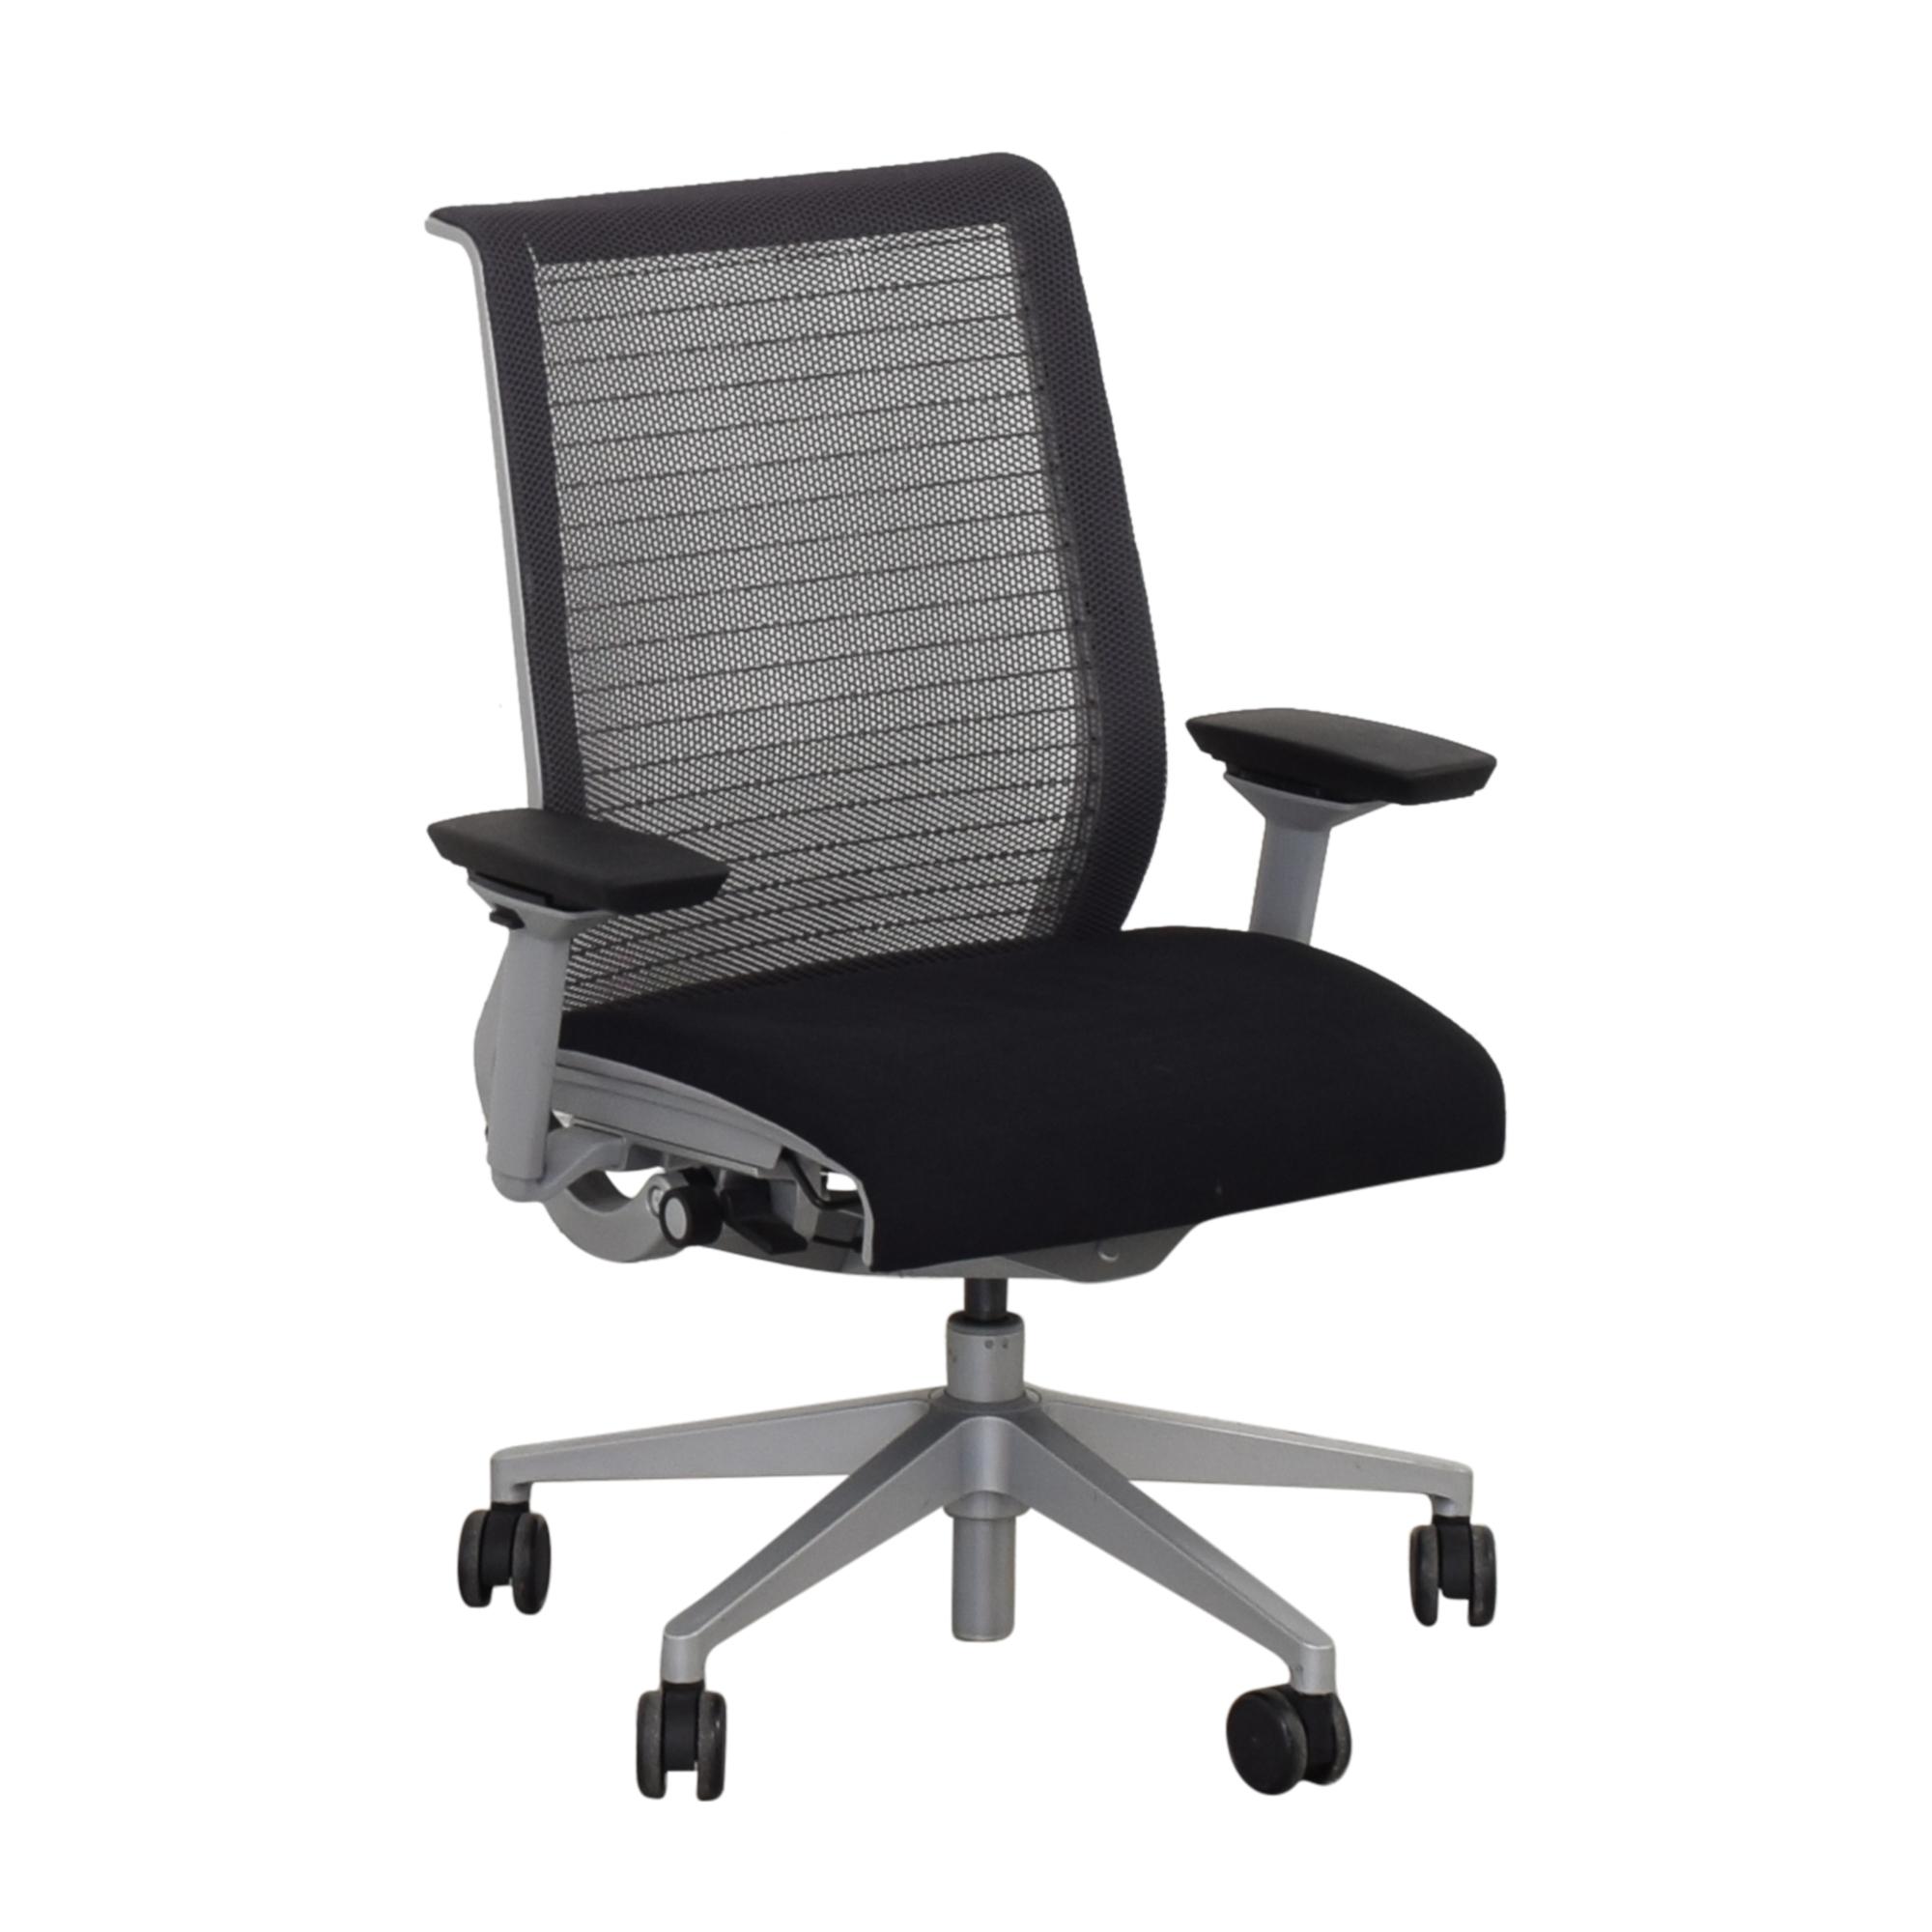 buy Steelcase Steelcase Cobi Swivel Chair online